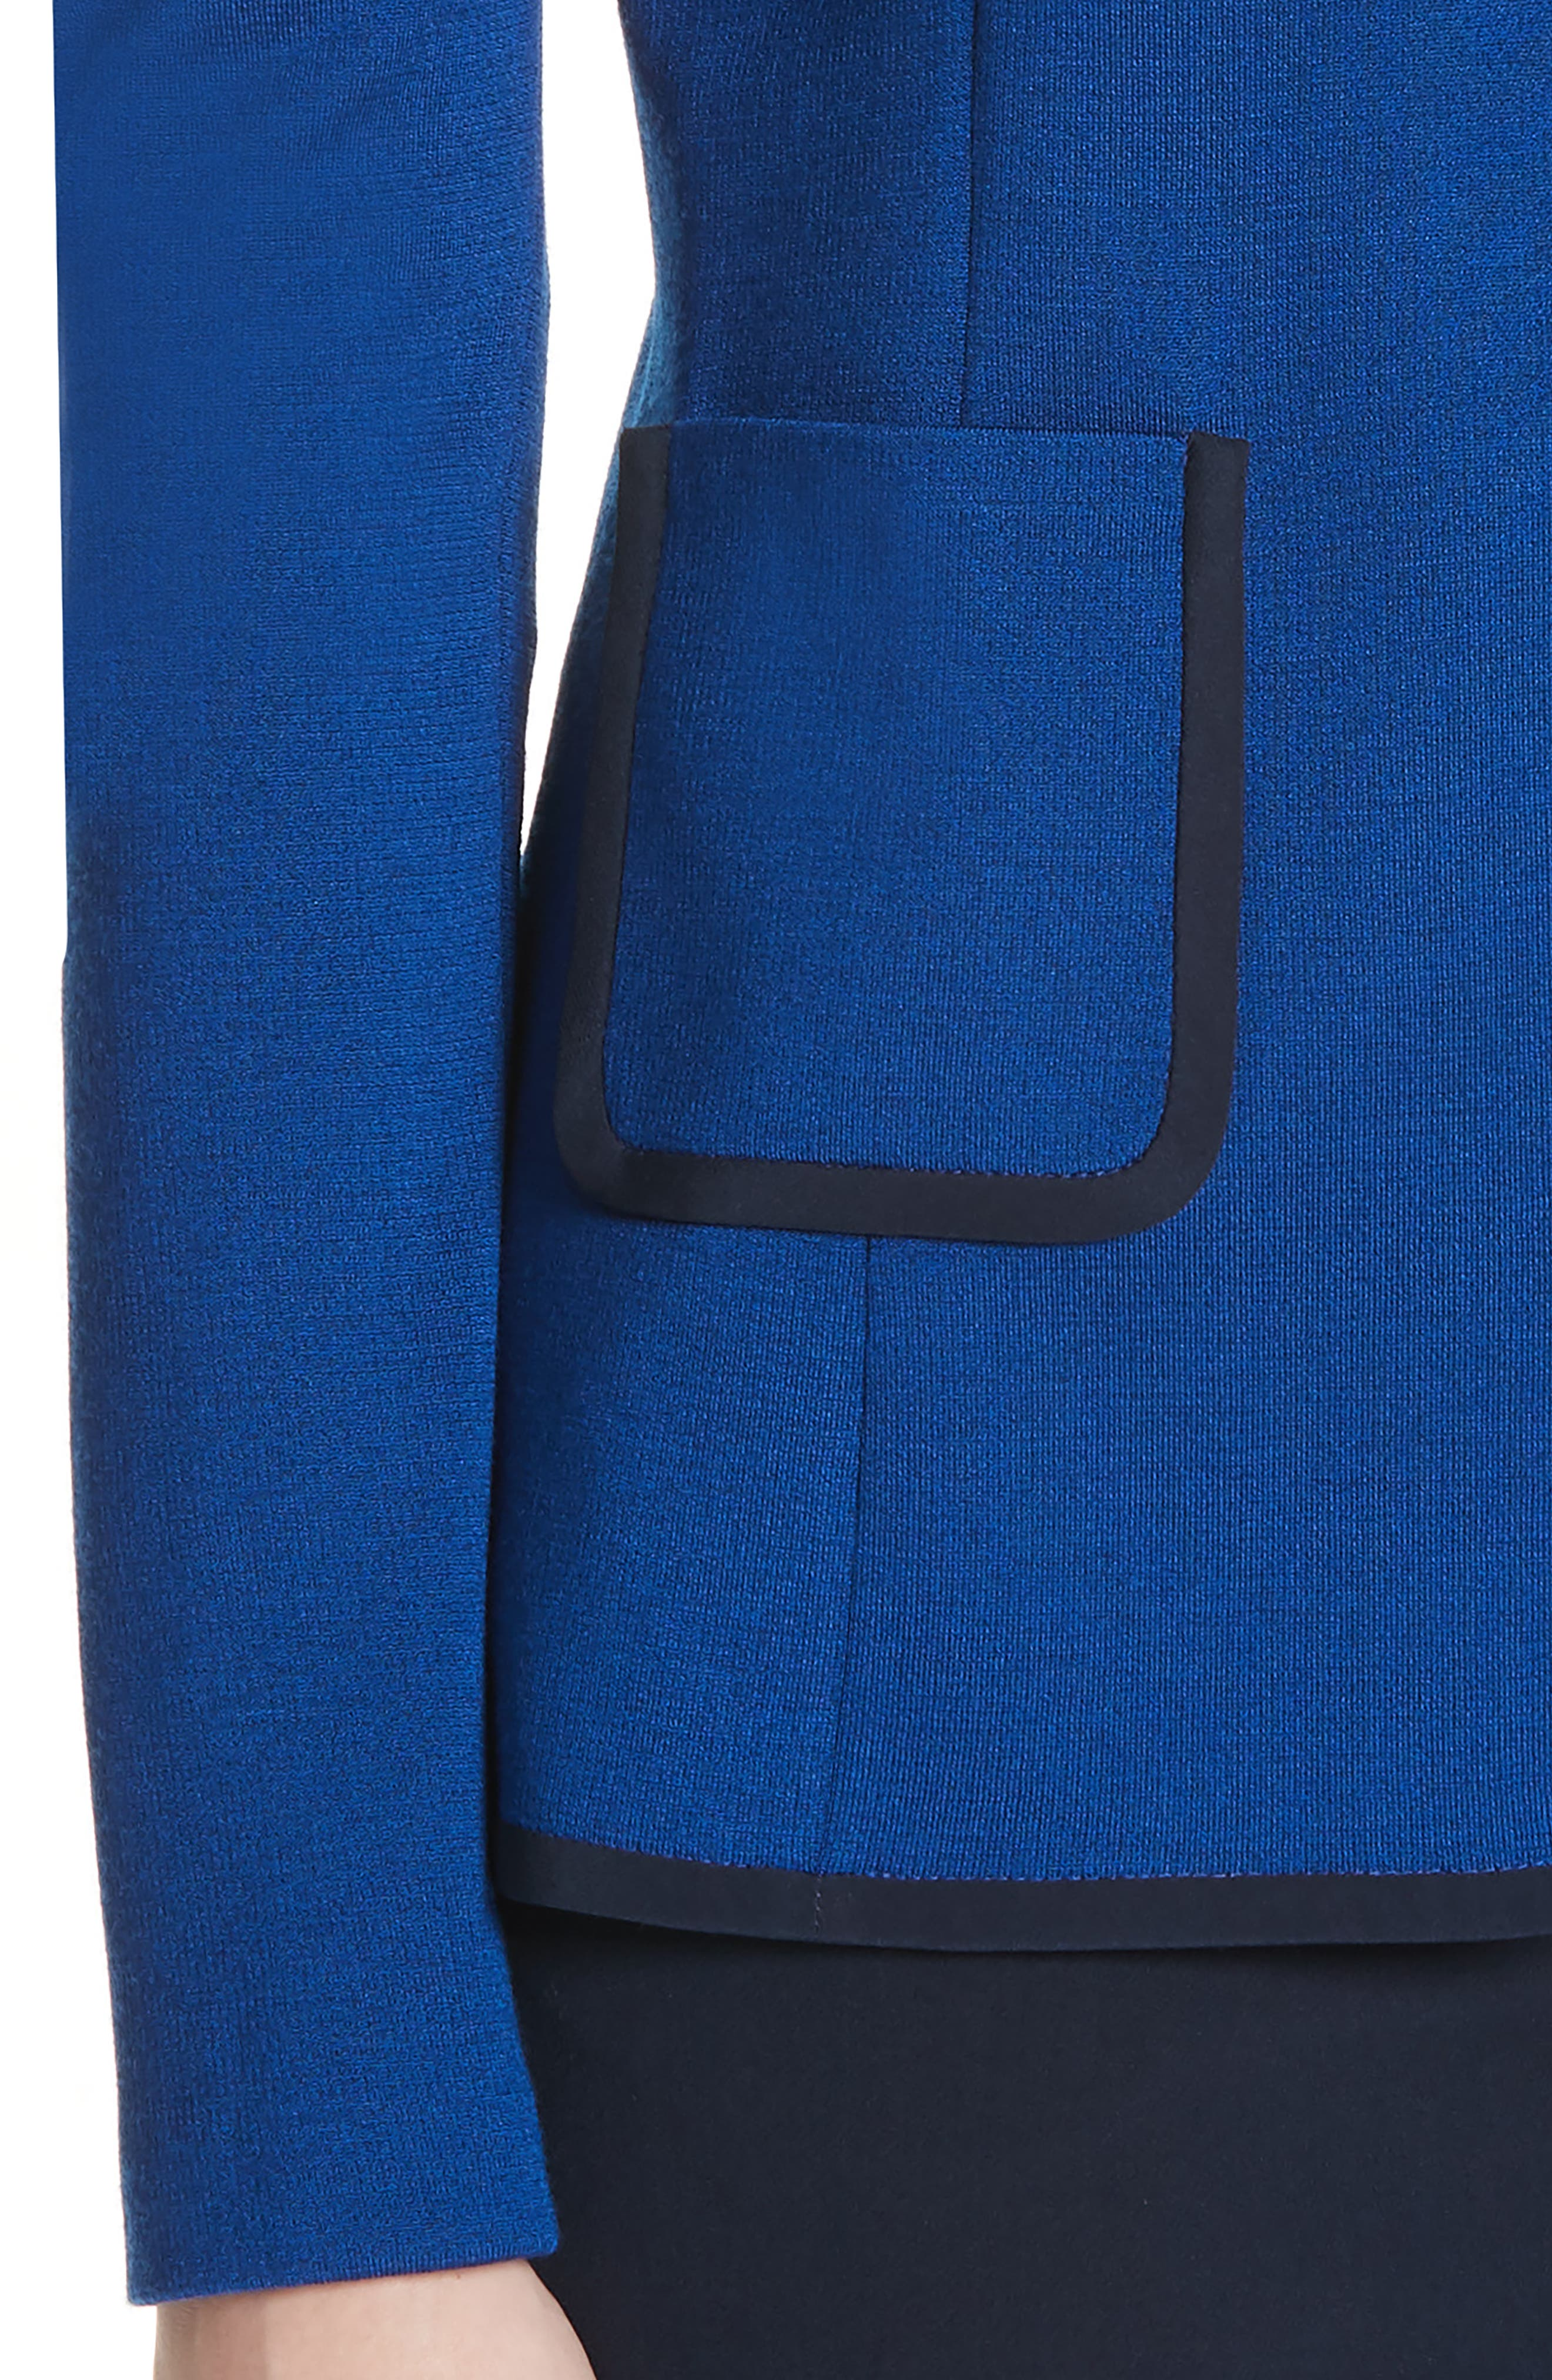 ST. JOHN COLLECTION, Patch Pocket Milano Knit Jacket, Alternate thumbnail 5, color, AZUL/ NAVY